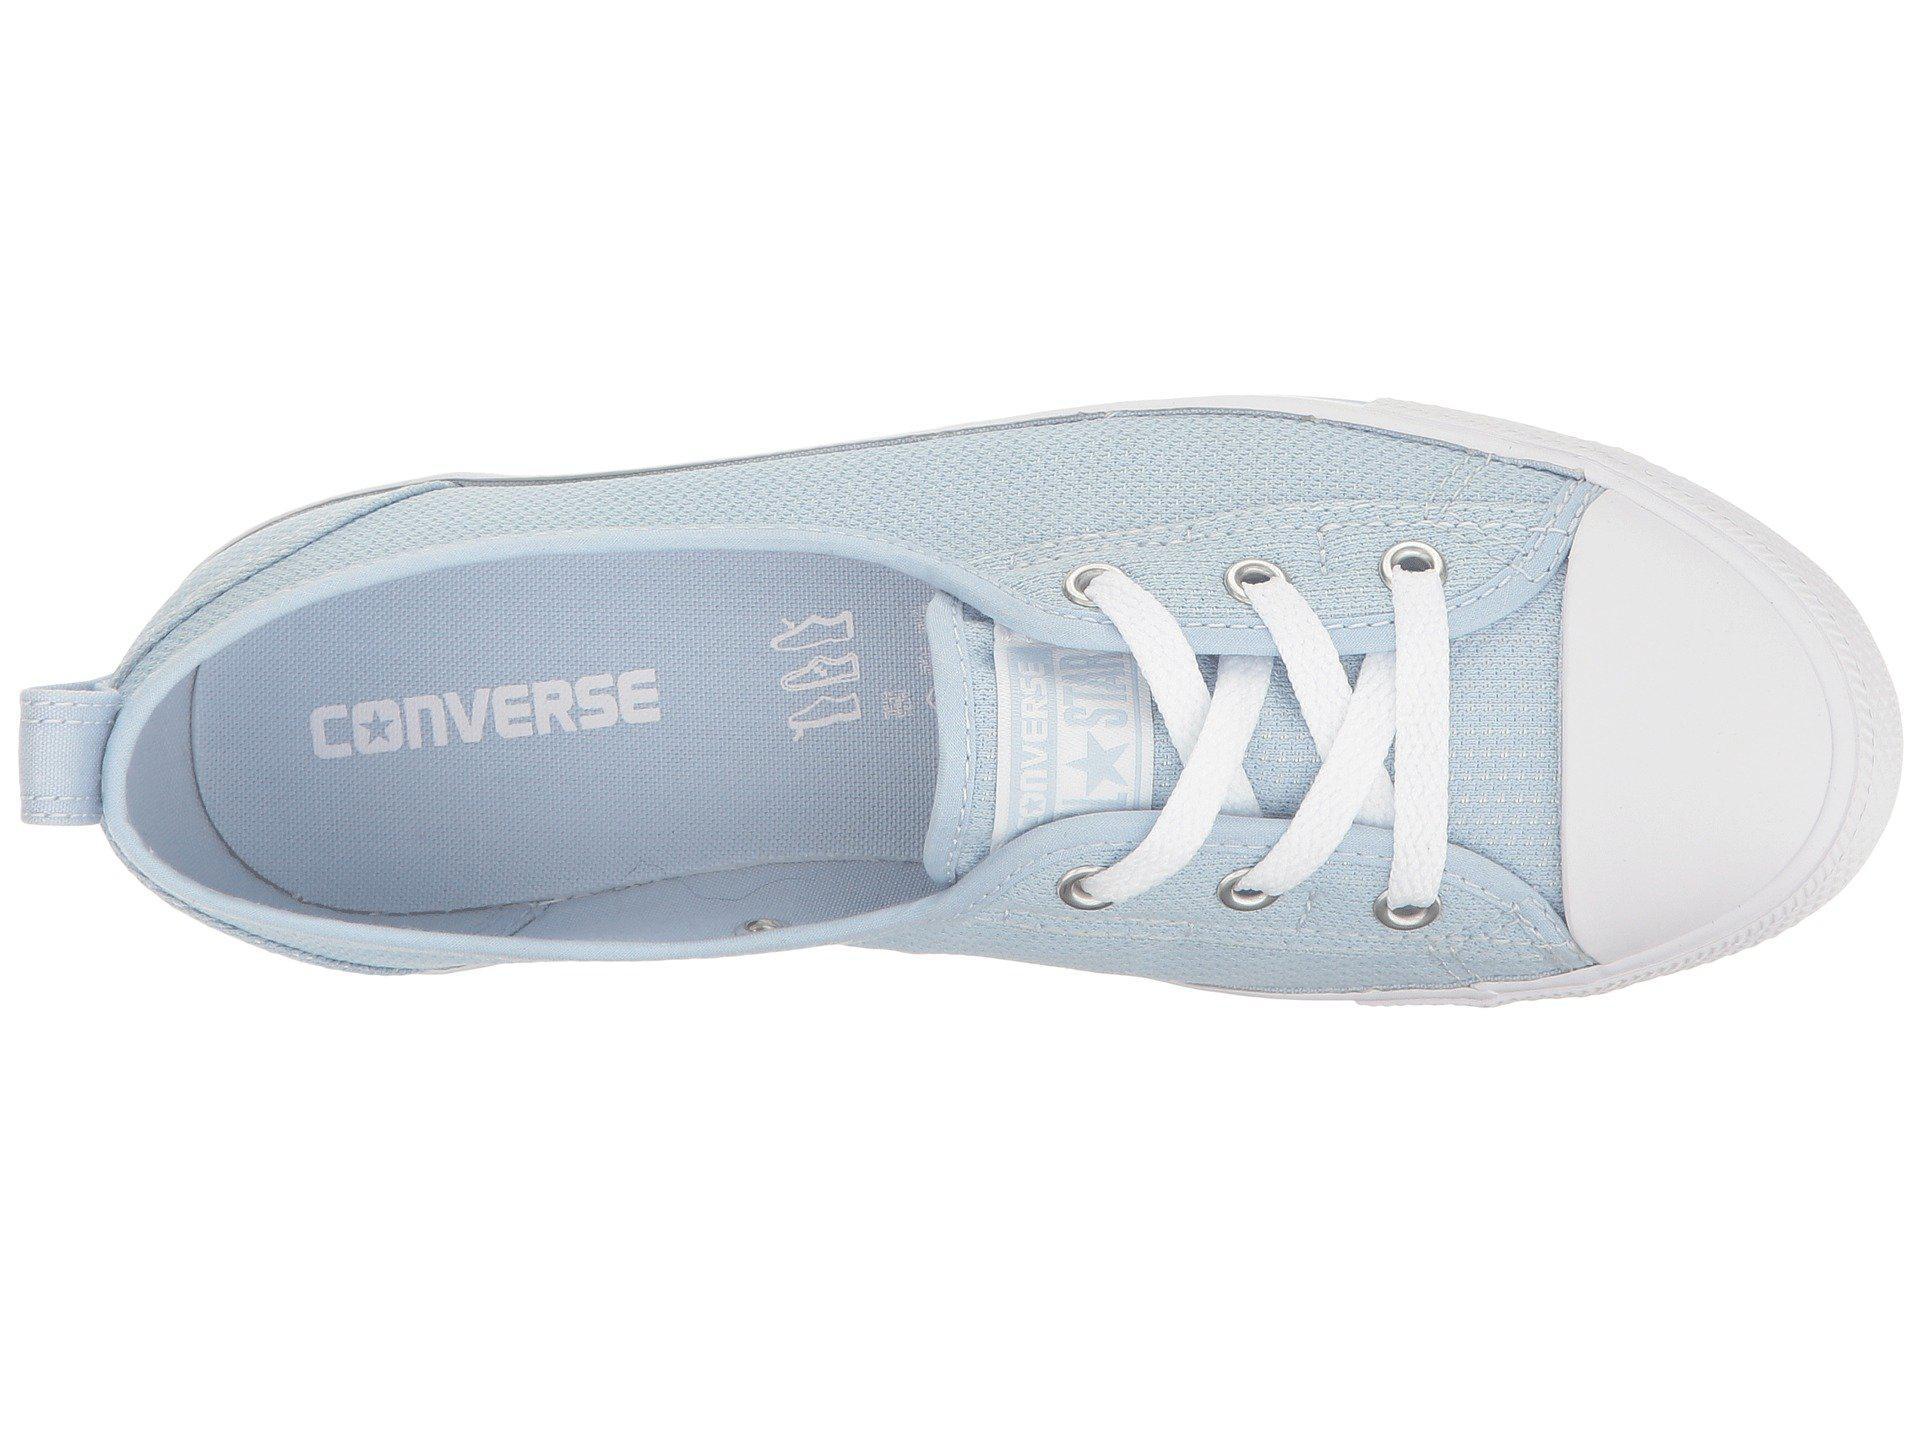 Lyst - Converse Chuck Taylor® All Star® Ballet Lace Micro Dot Slip ... d4928073c